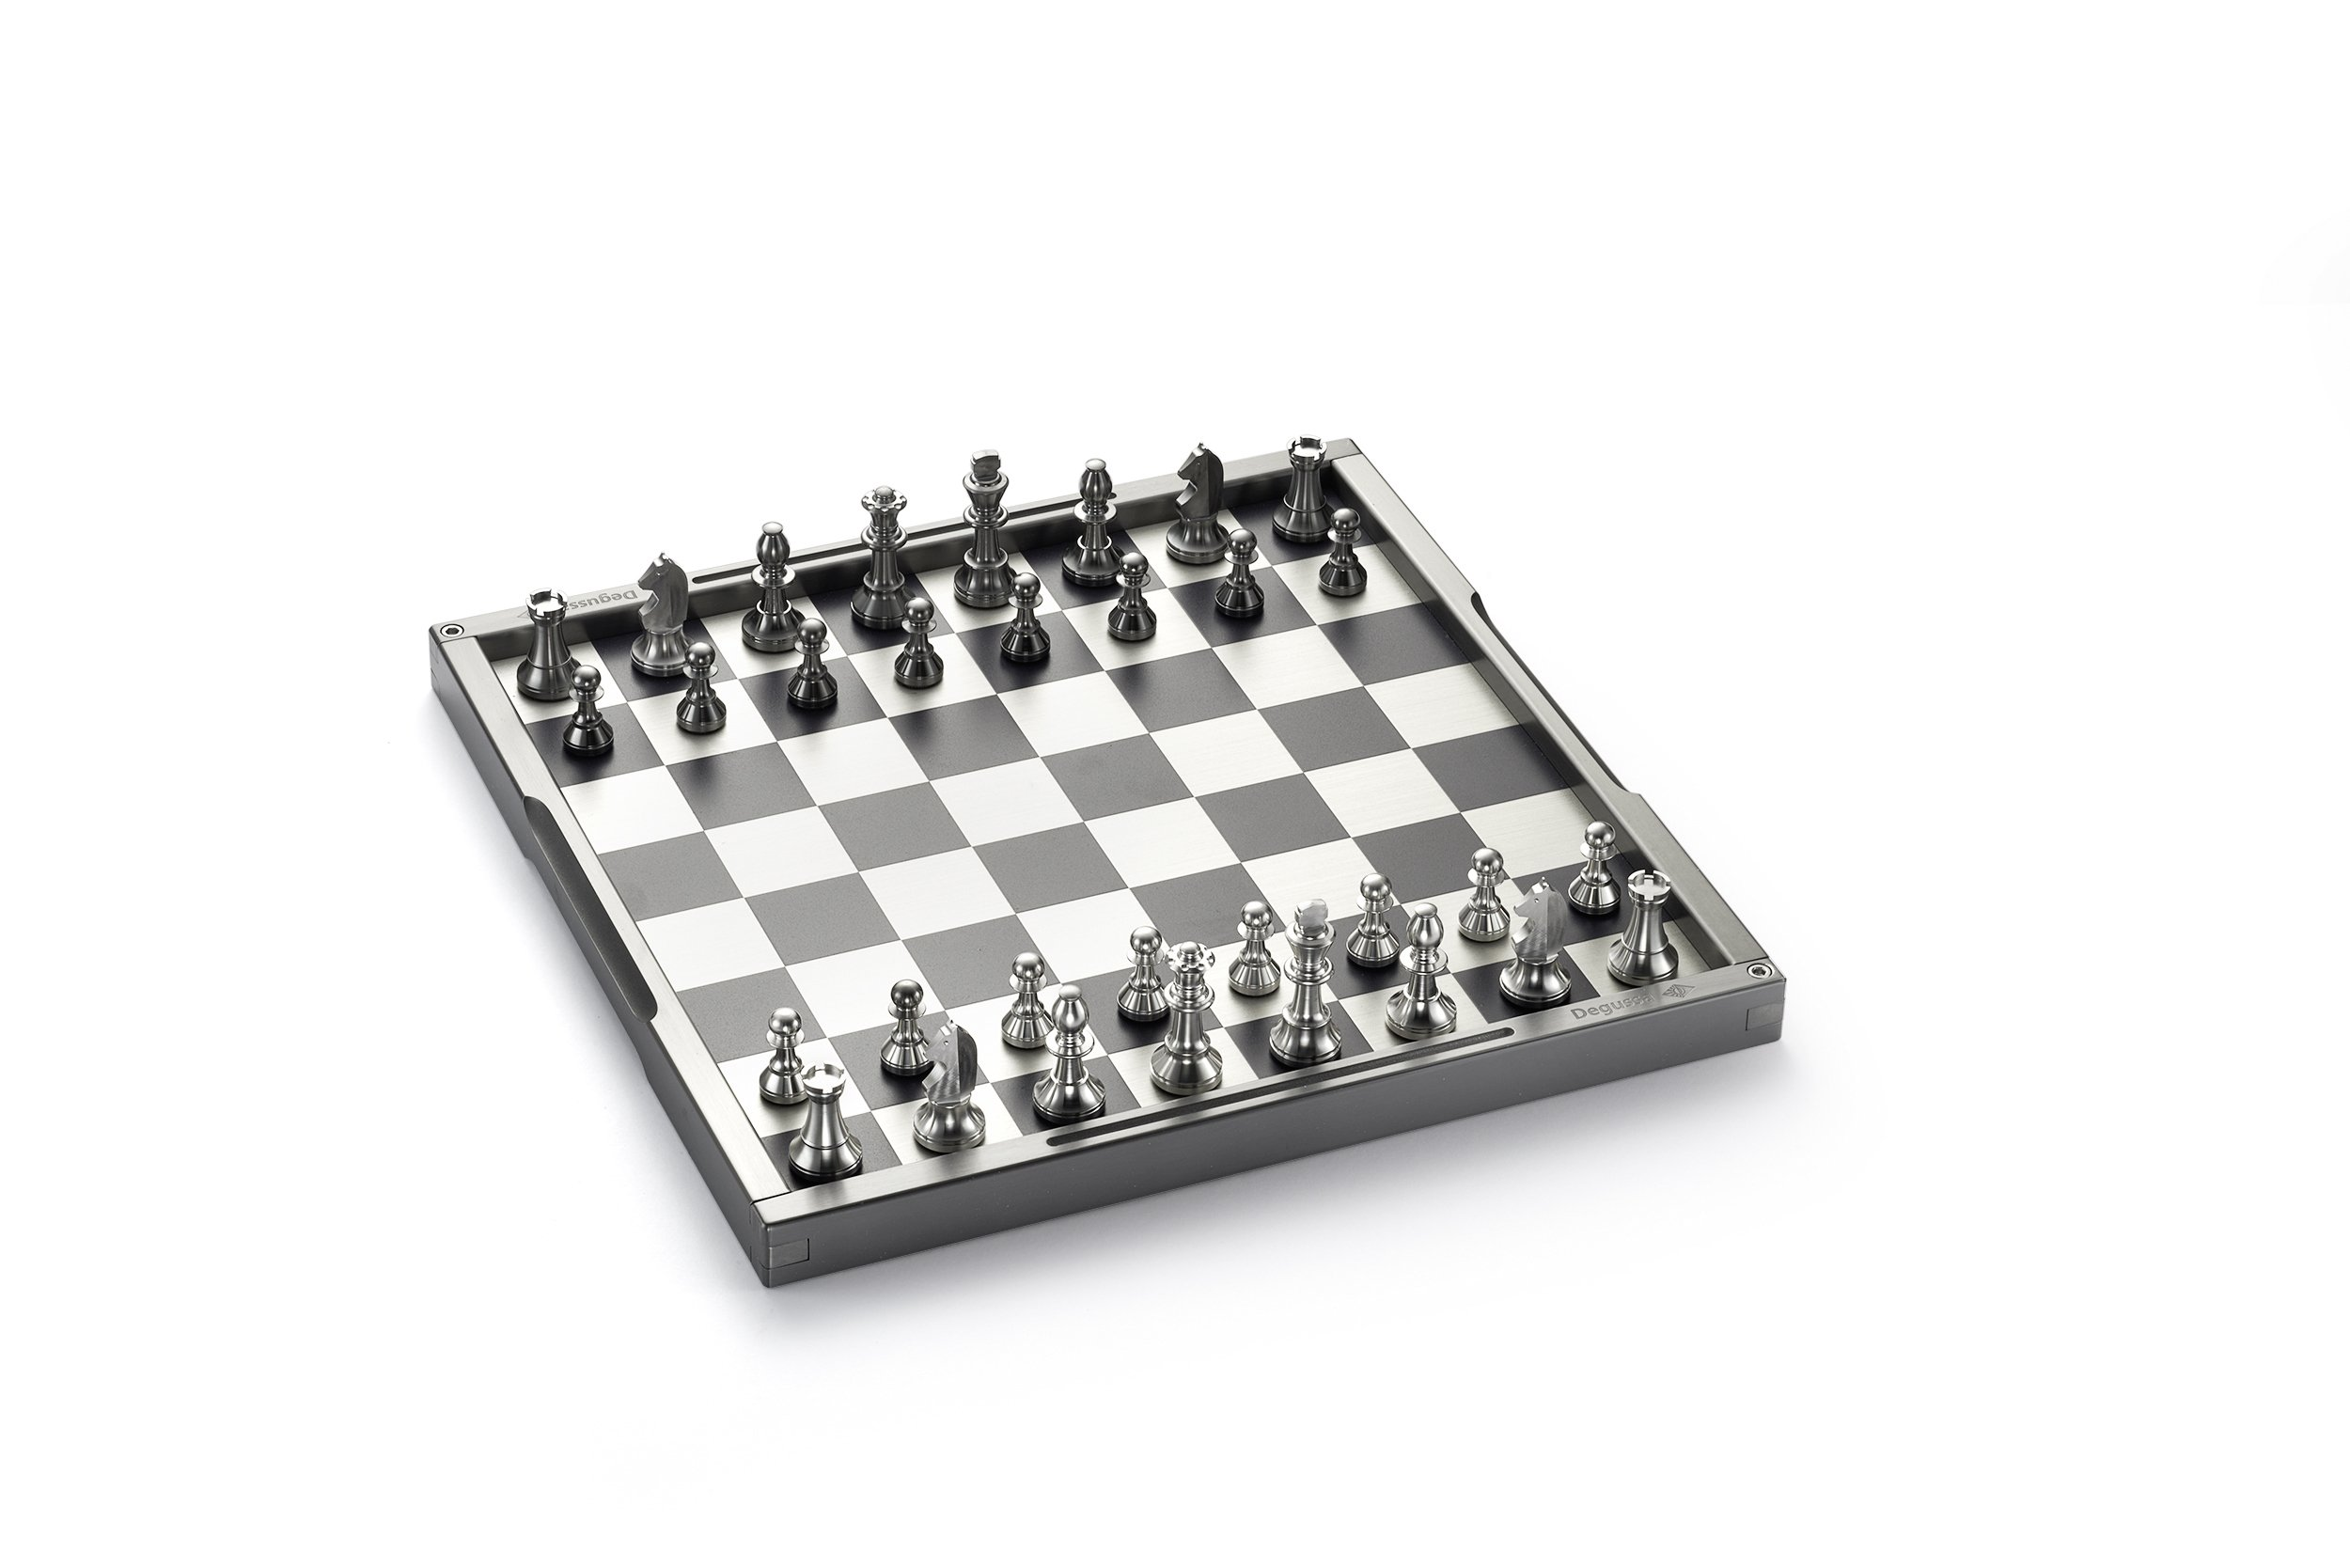 Degussa Schachspiel